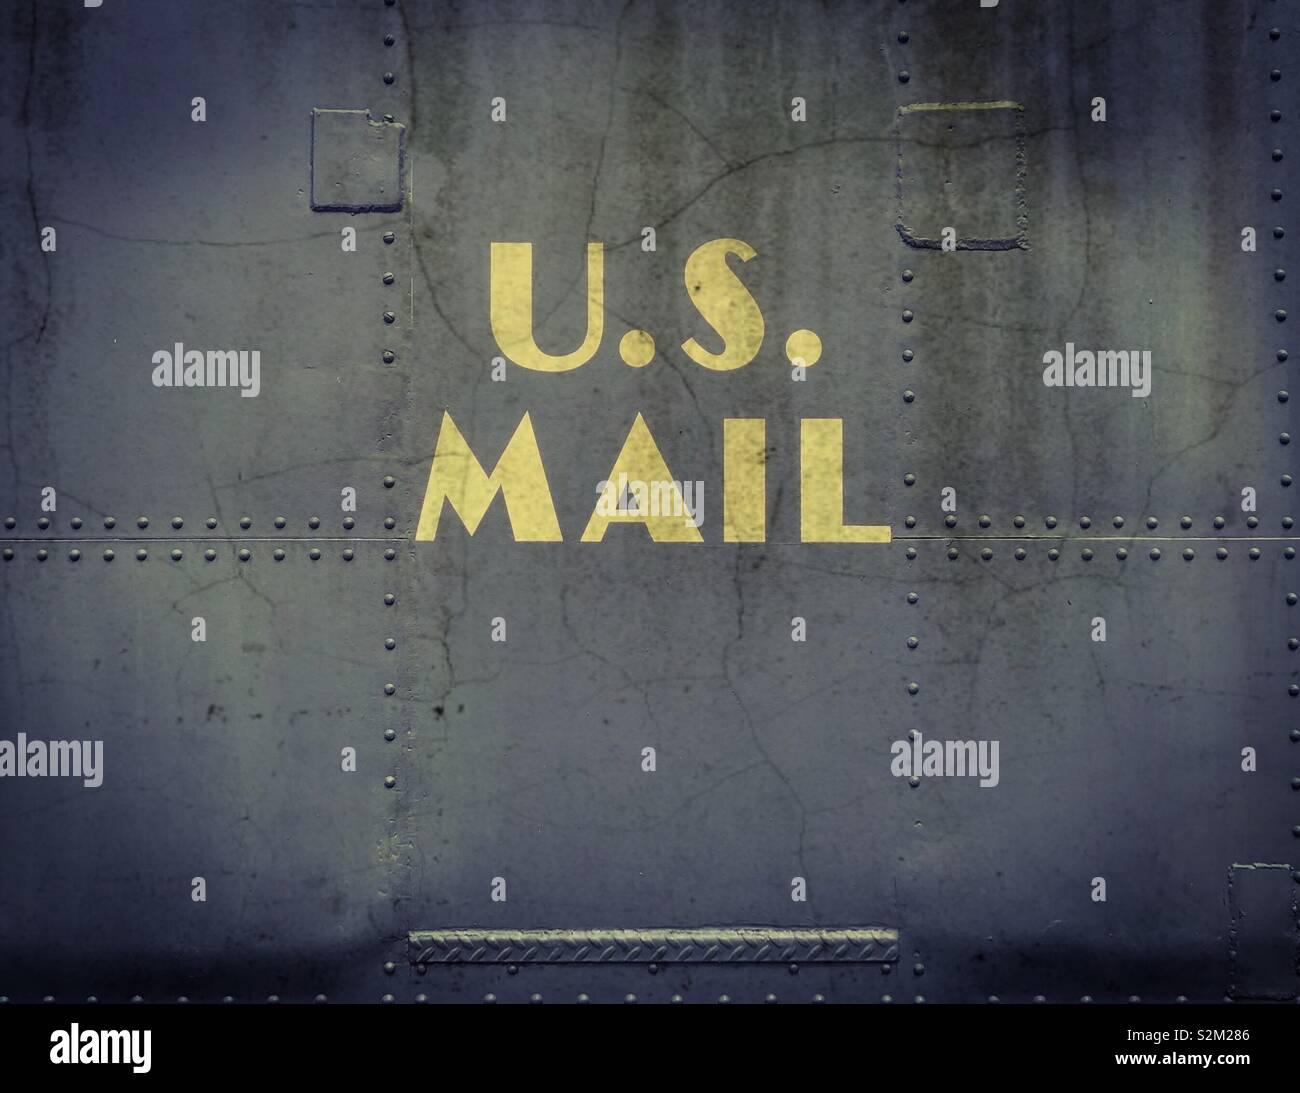 Old U.S. Mail Train Car - Stock Image